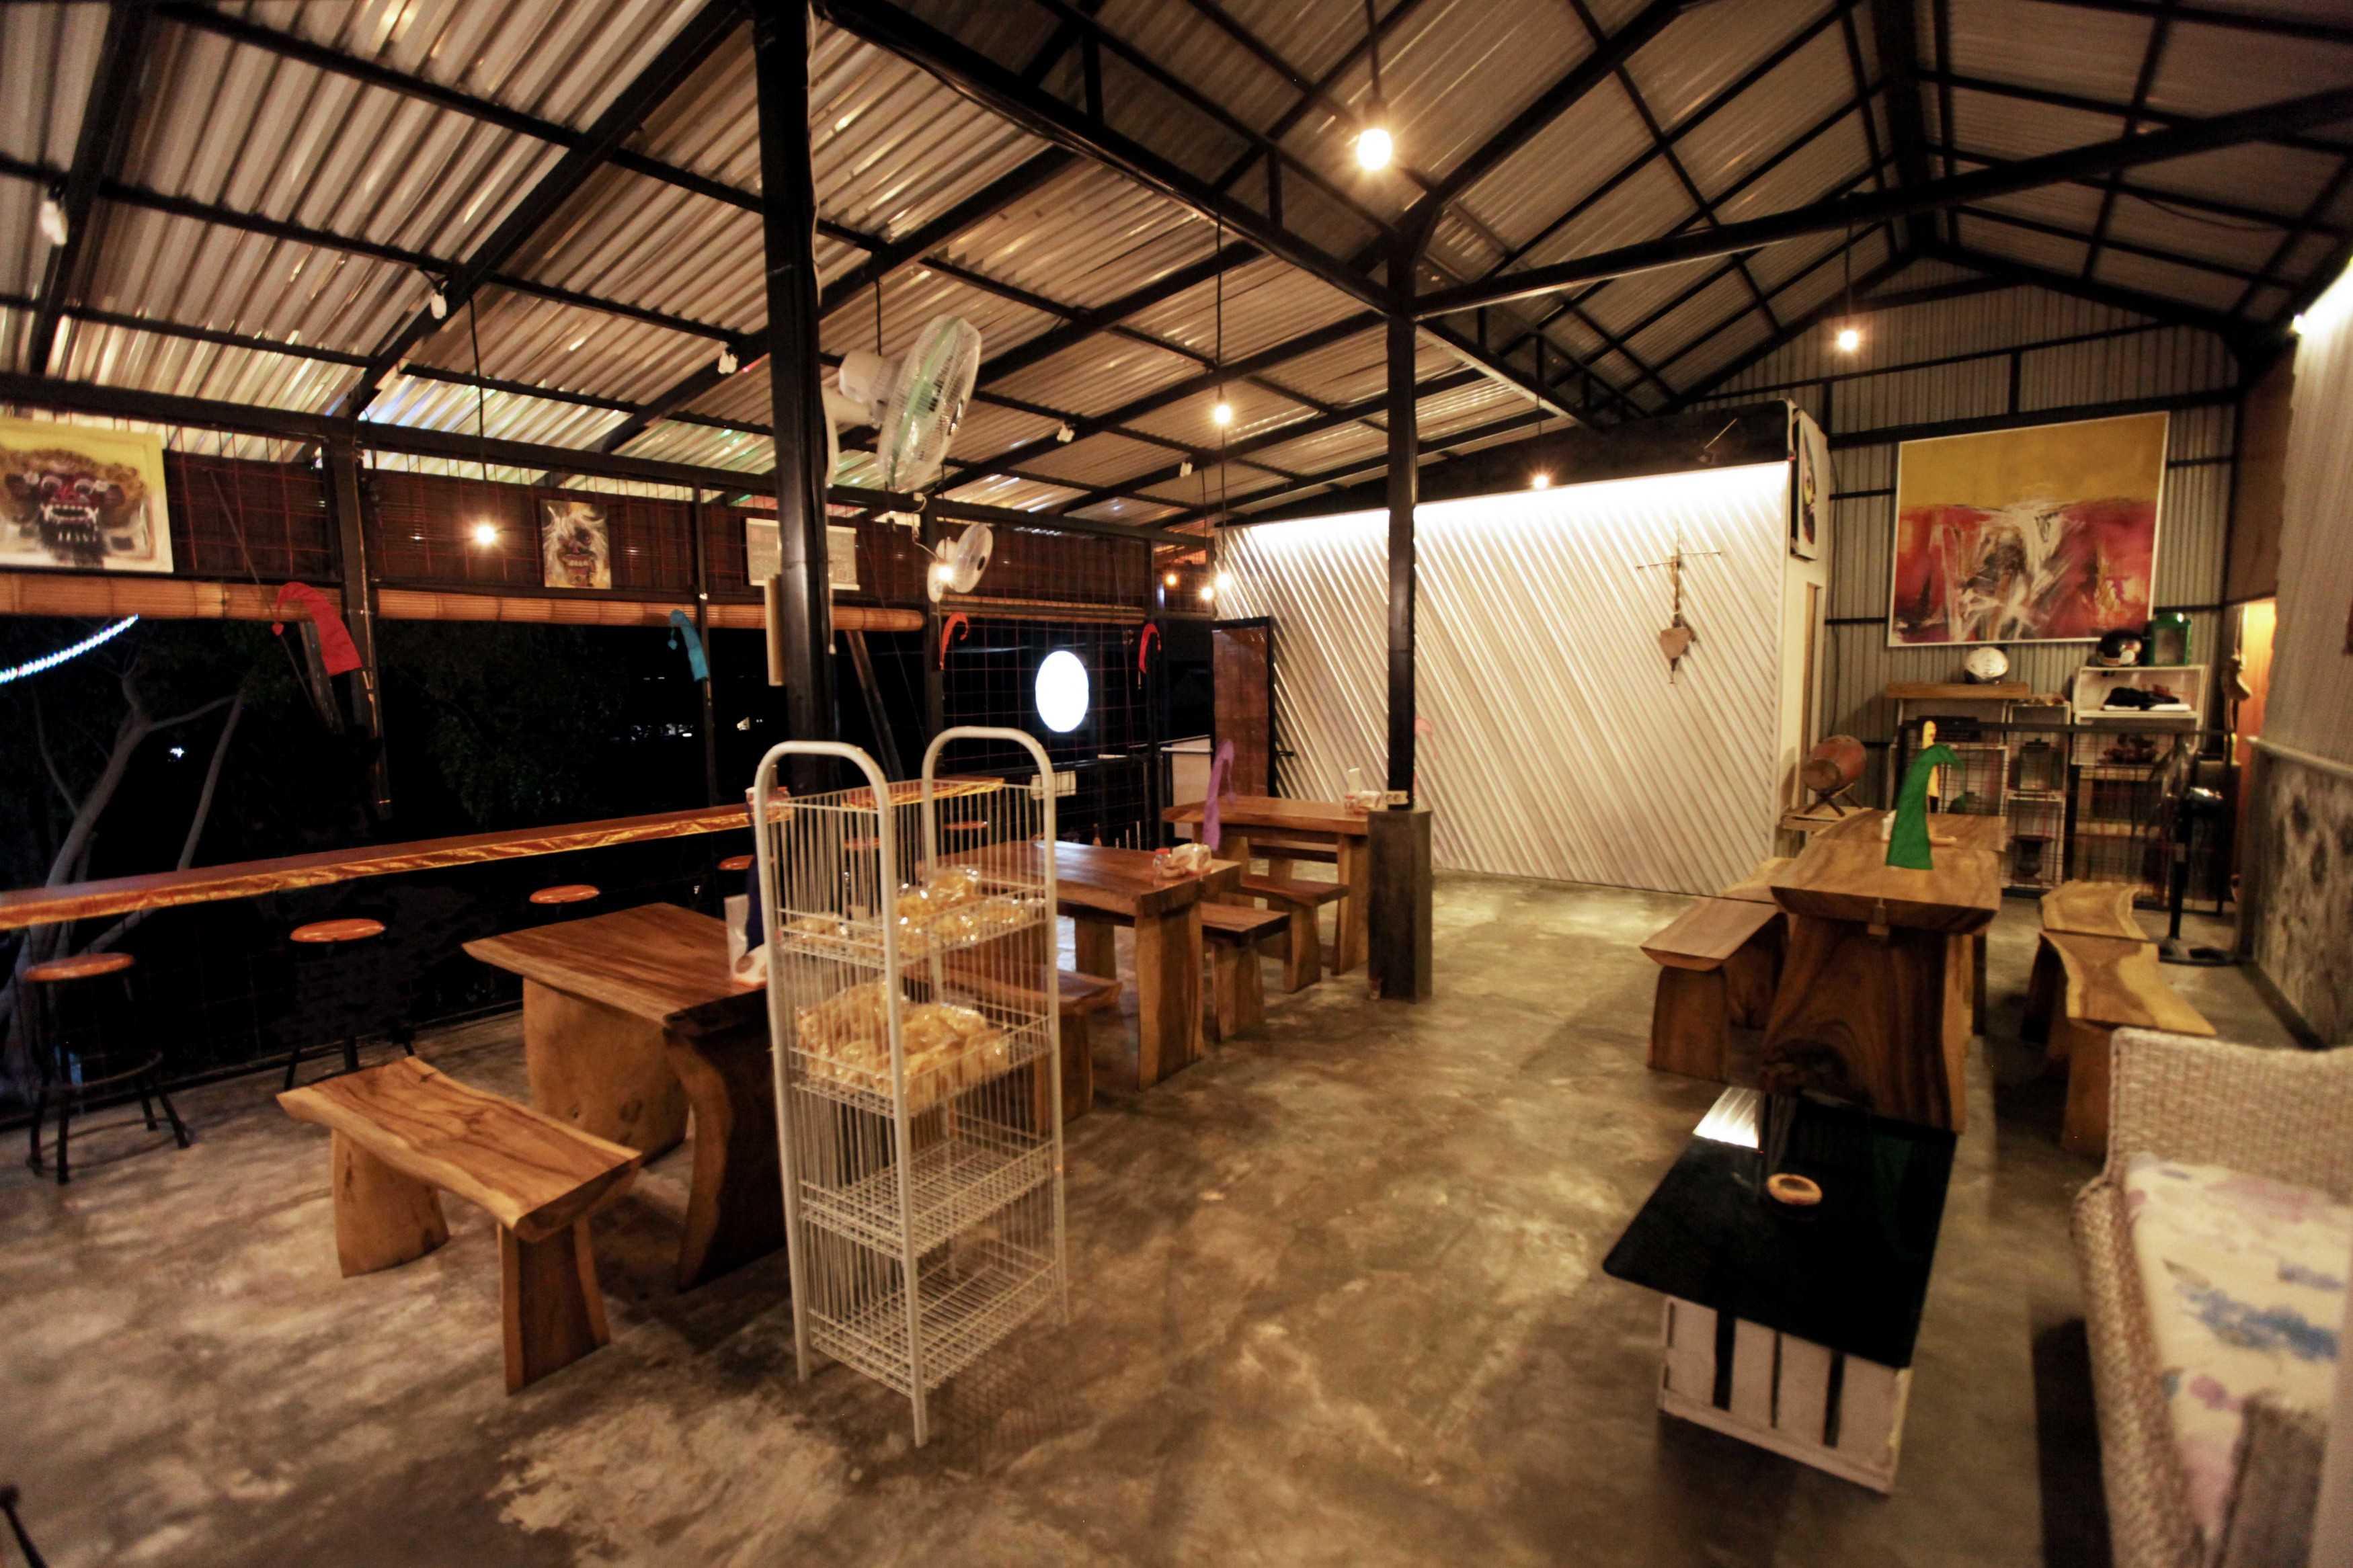 Saso Architecture Studio Jenang Bali Bali, Indonesia Bali Img9029-Edit Asian,tradisional,tropis  27574